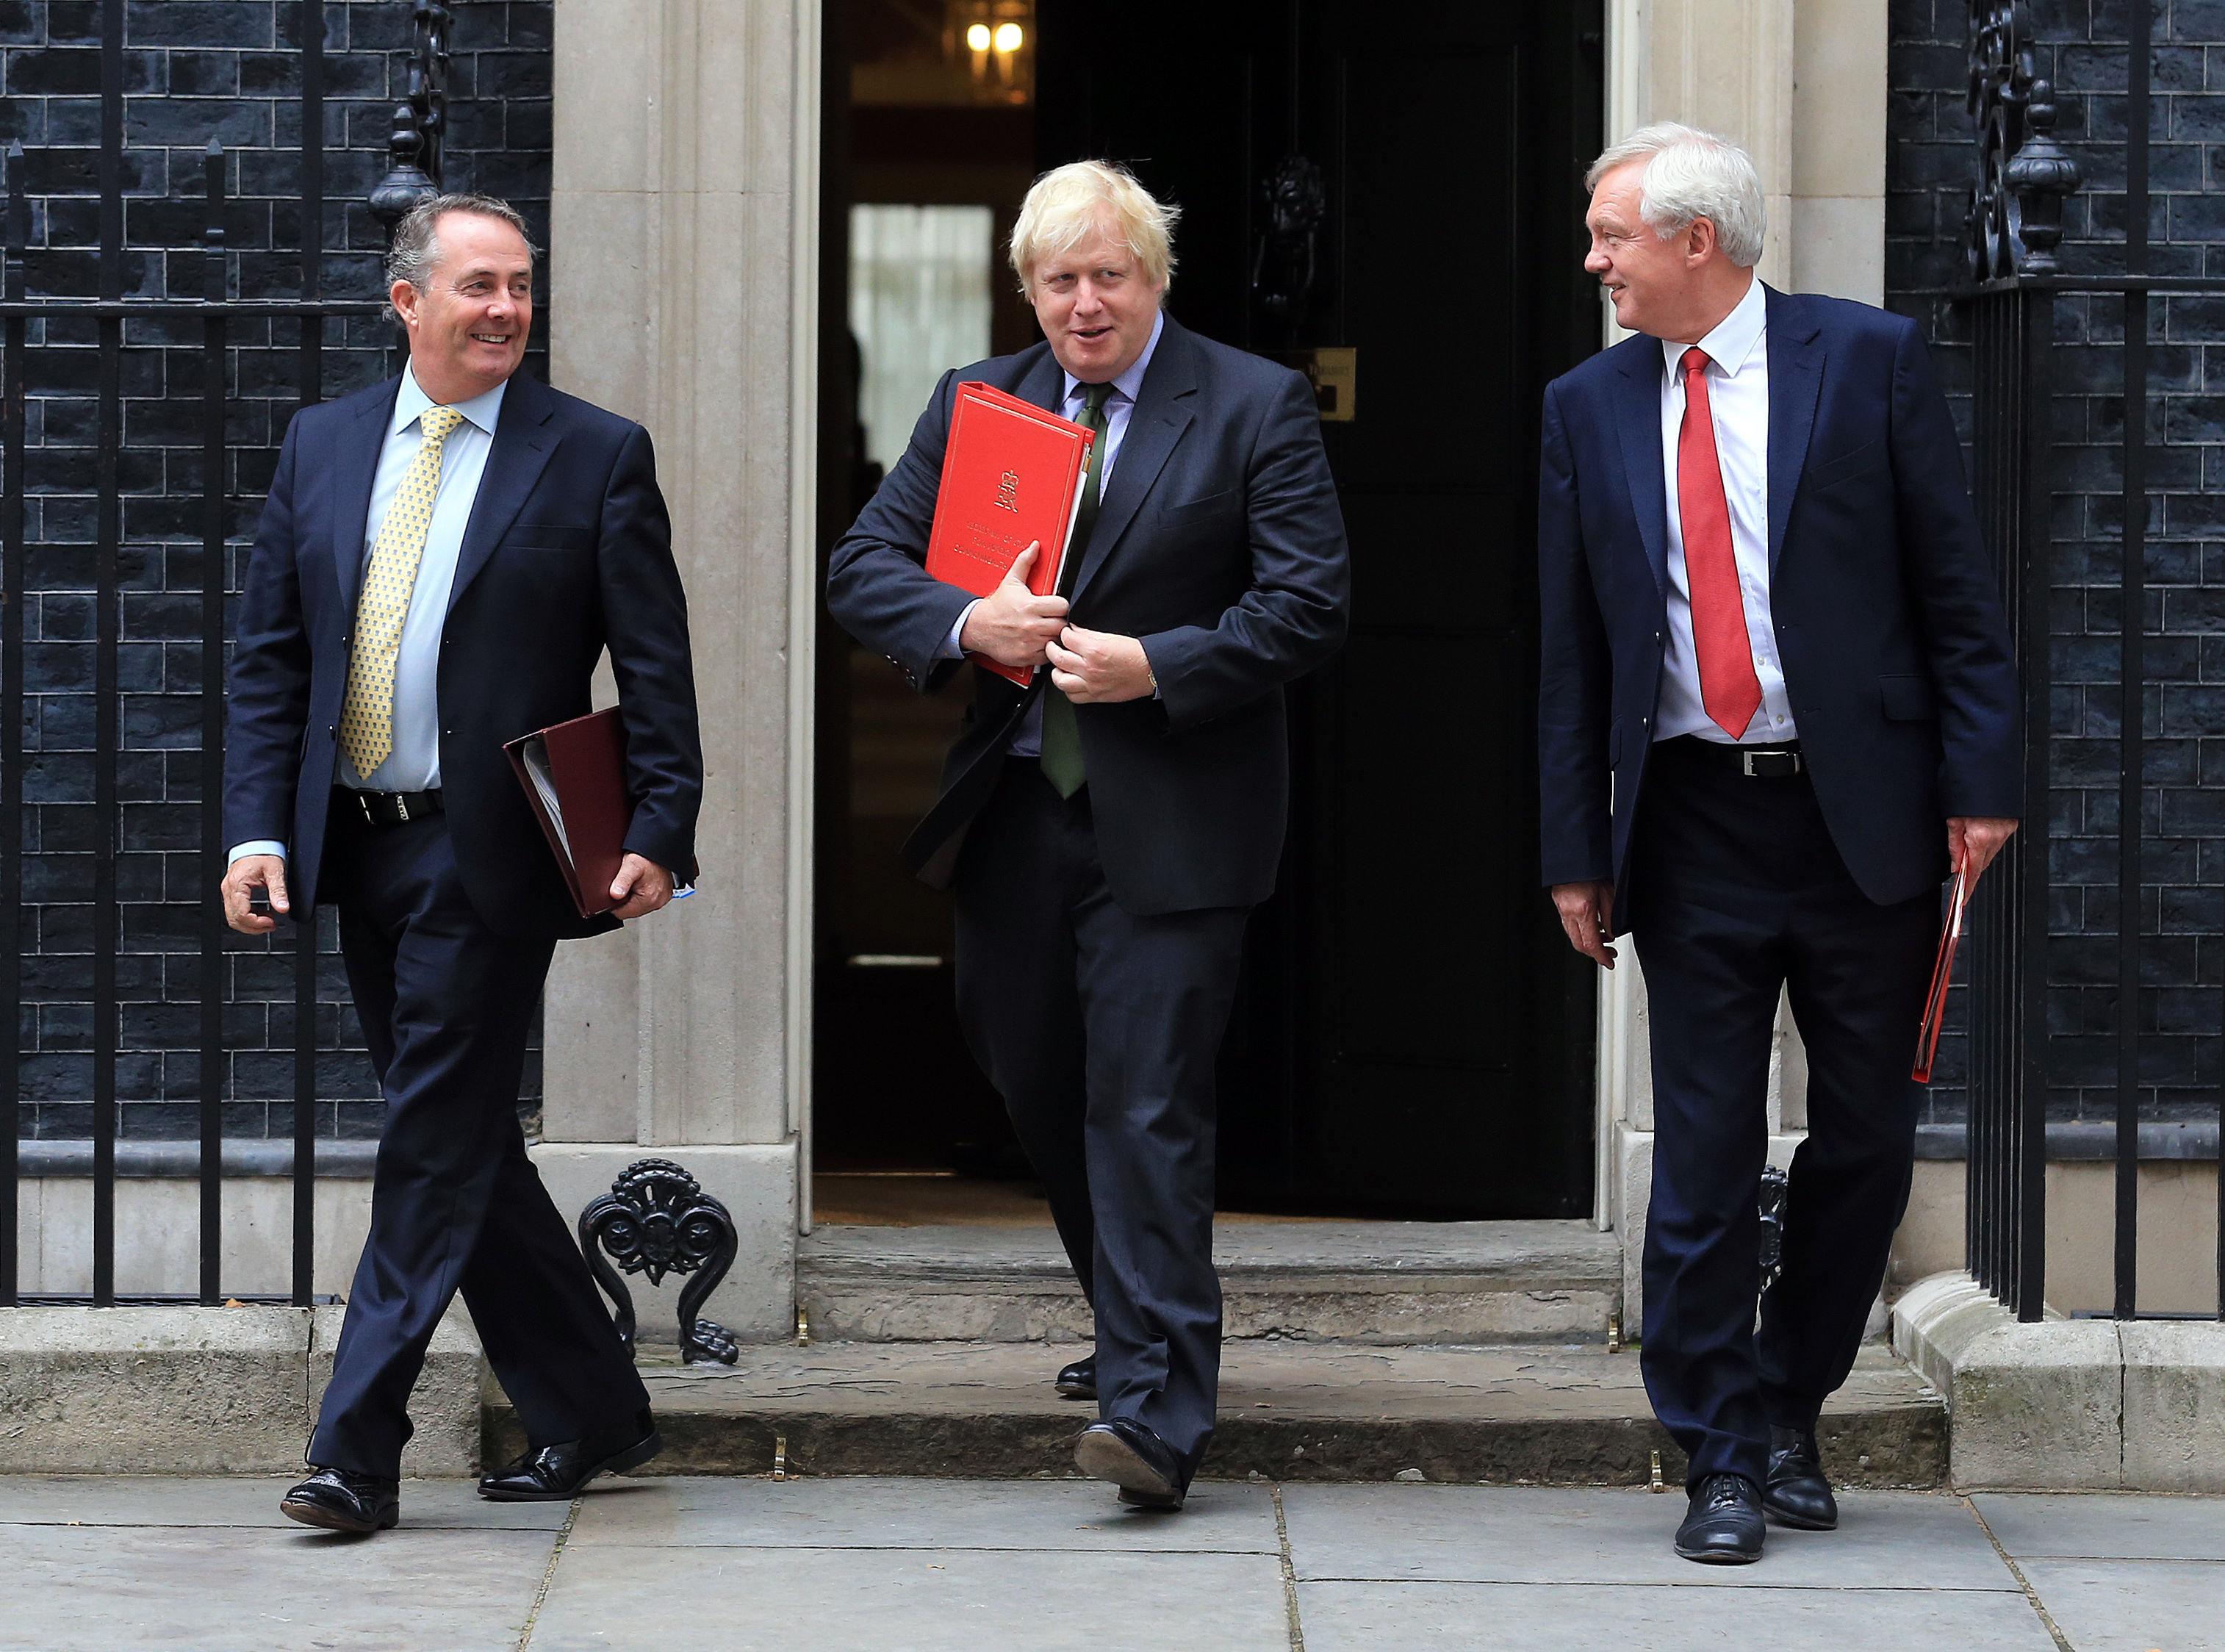 <strong>The three Brexiteers, International Trade Secretary Liam Fox, Foreign Secretary Boris Johnson and Brexit Secretary David Davis (l-r)&nbsp;</strong>